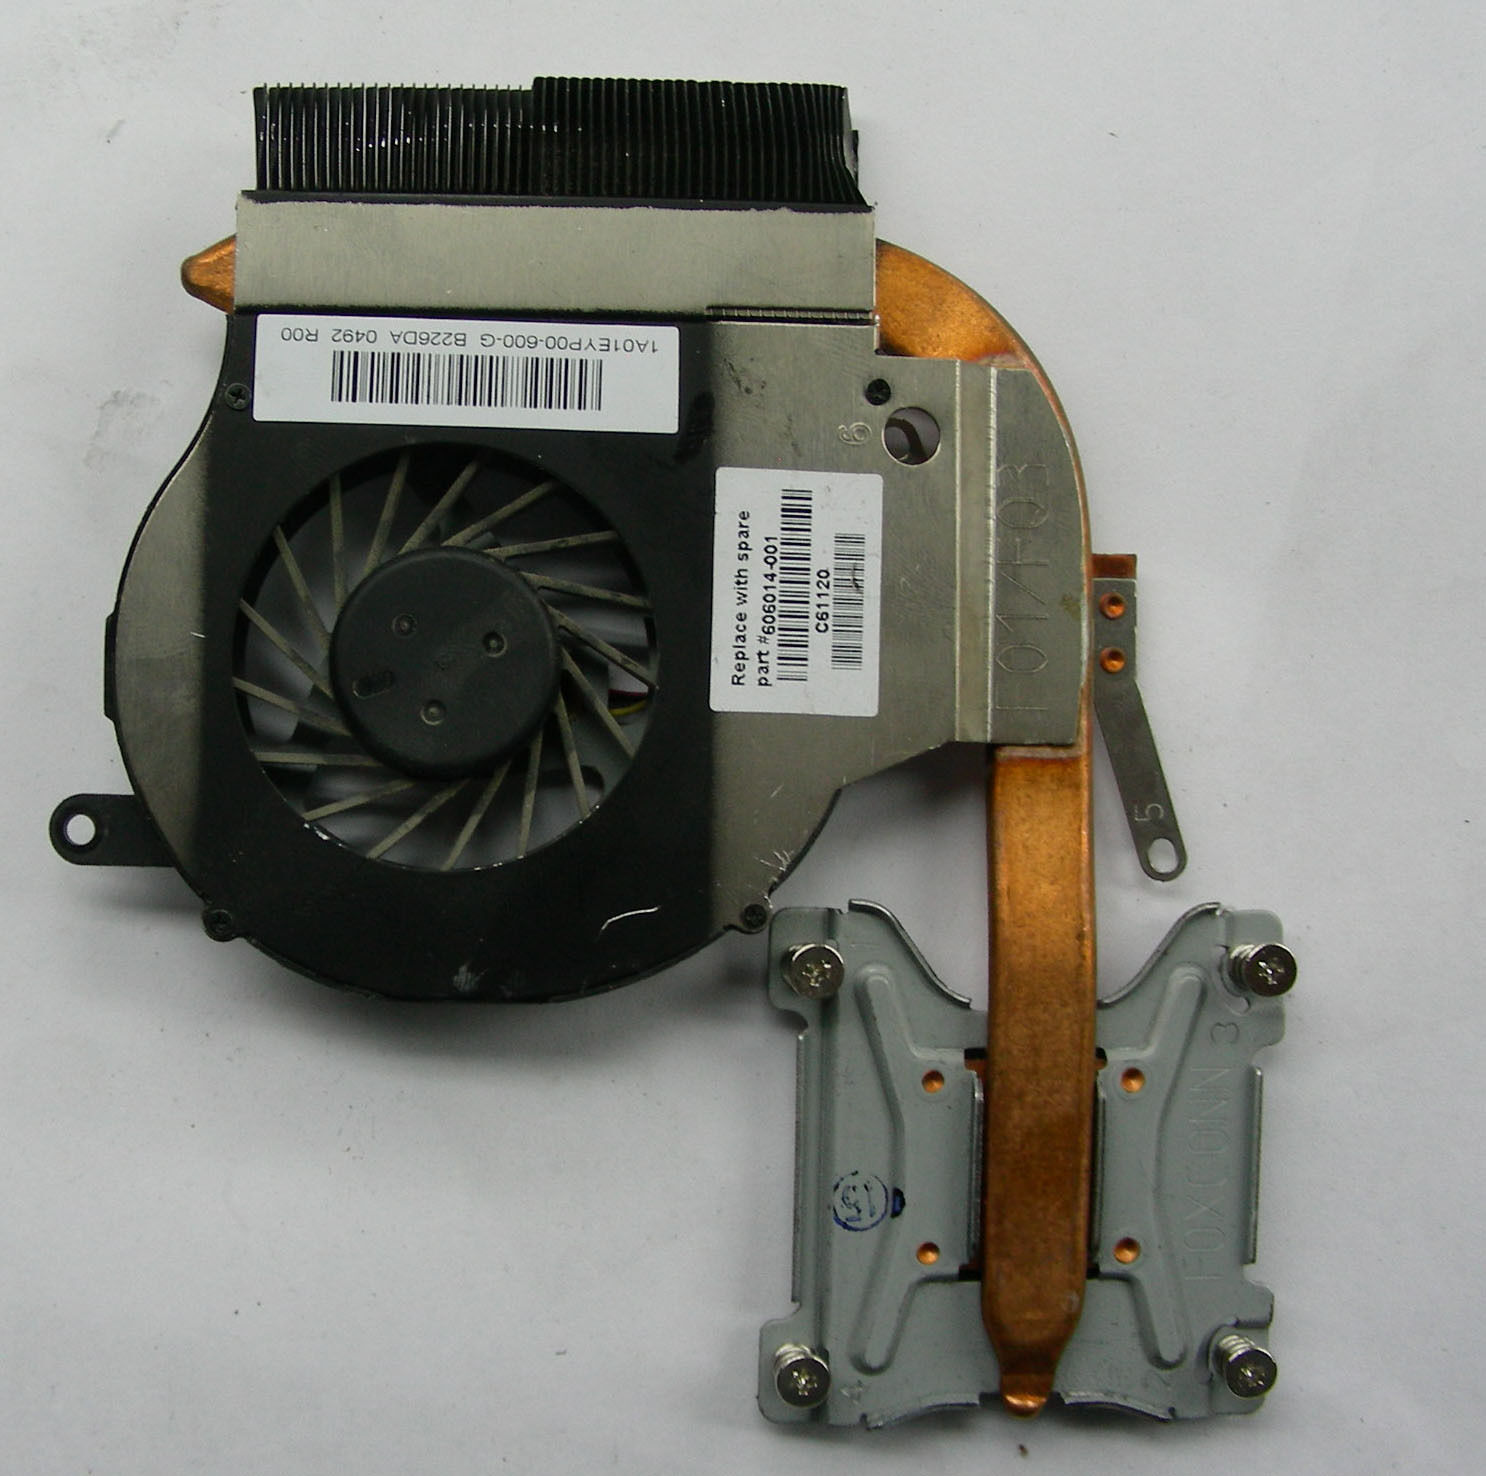 T30 correct fan operation? - eehelp com